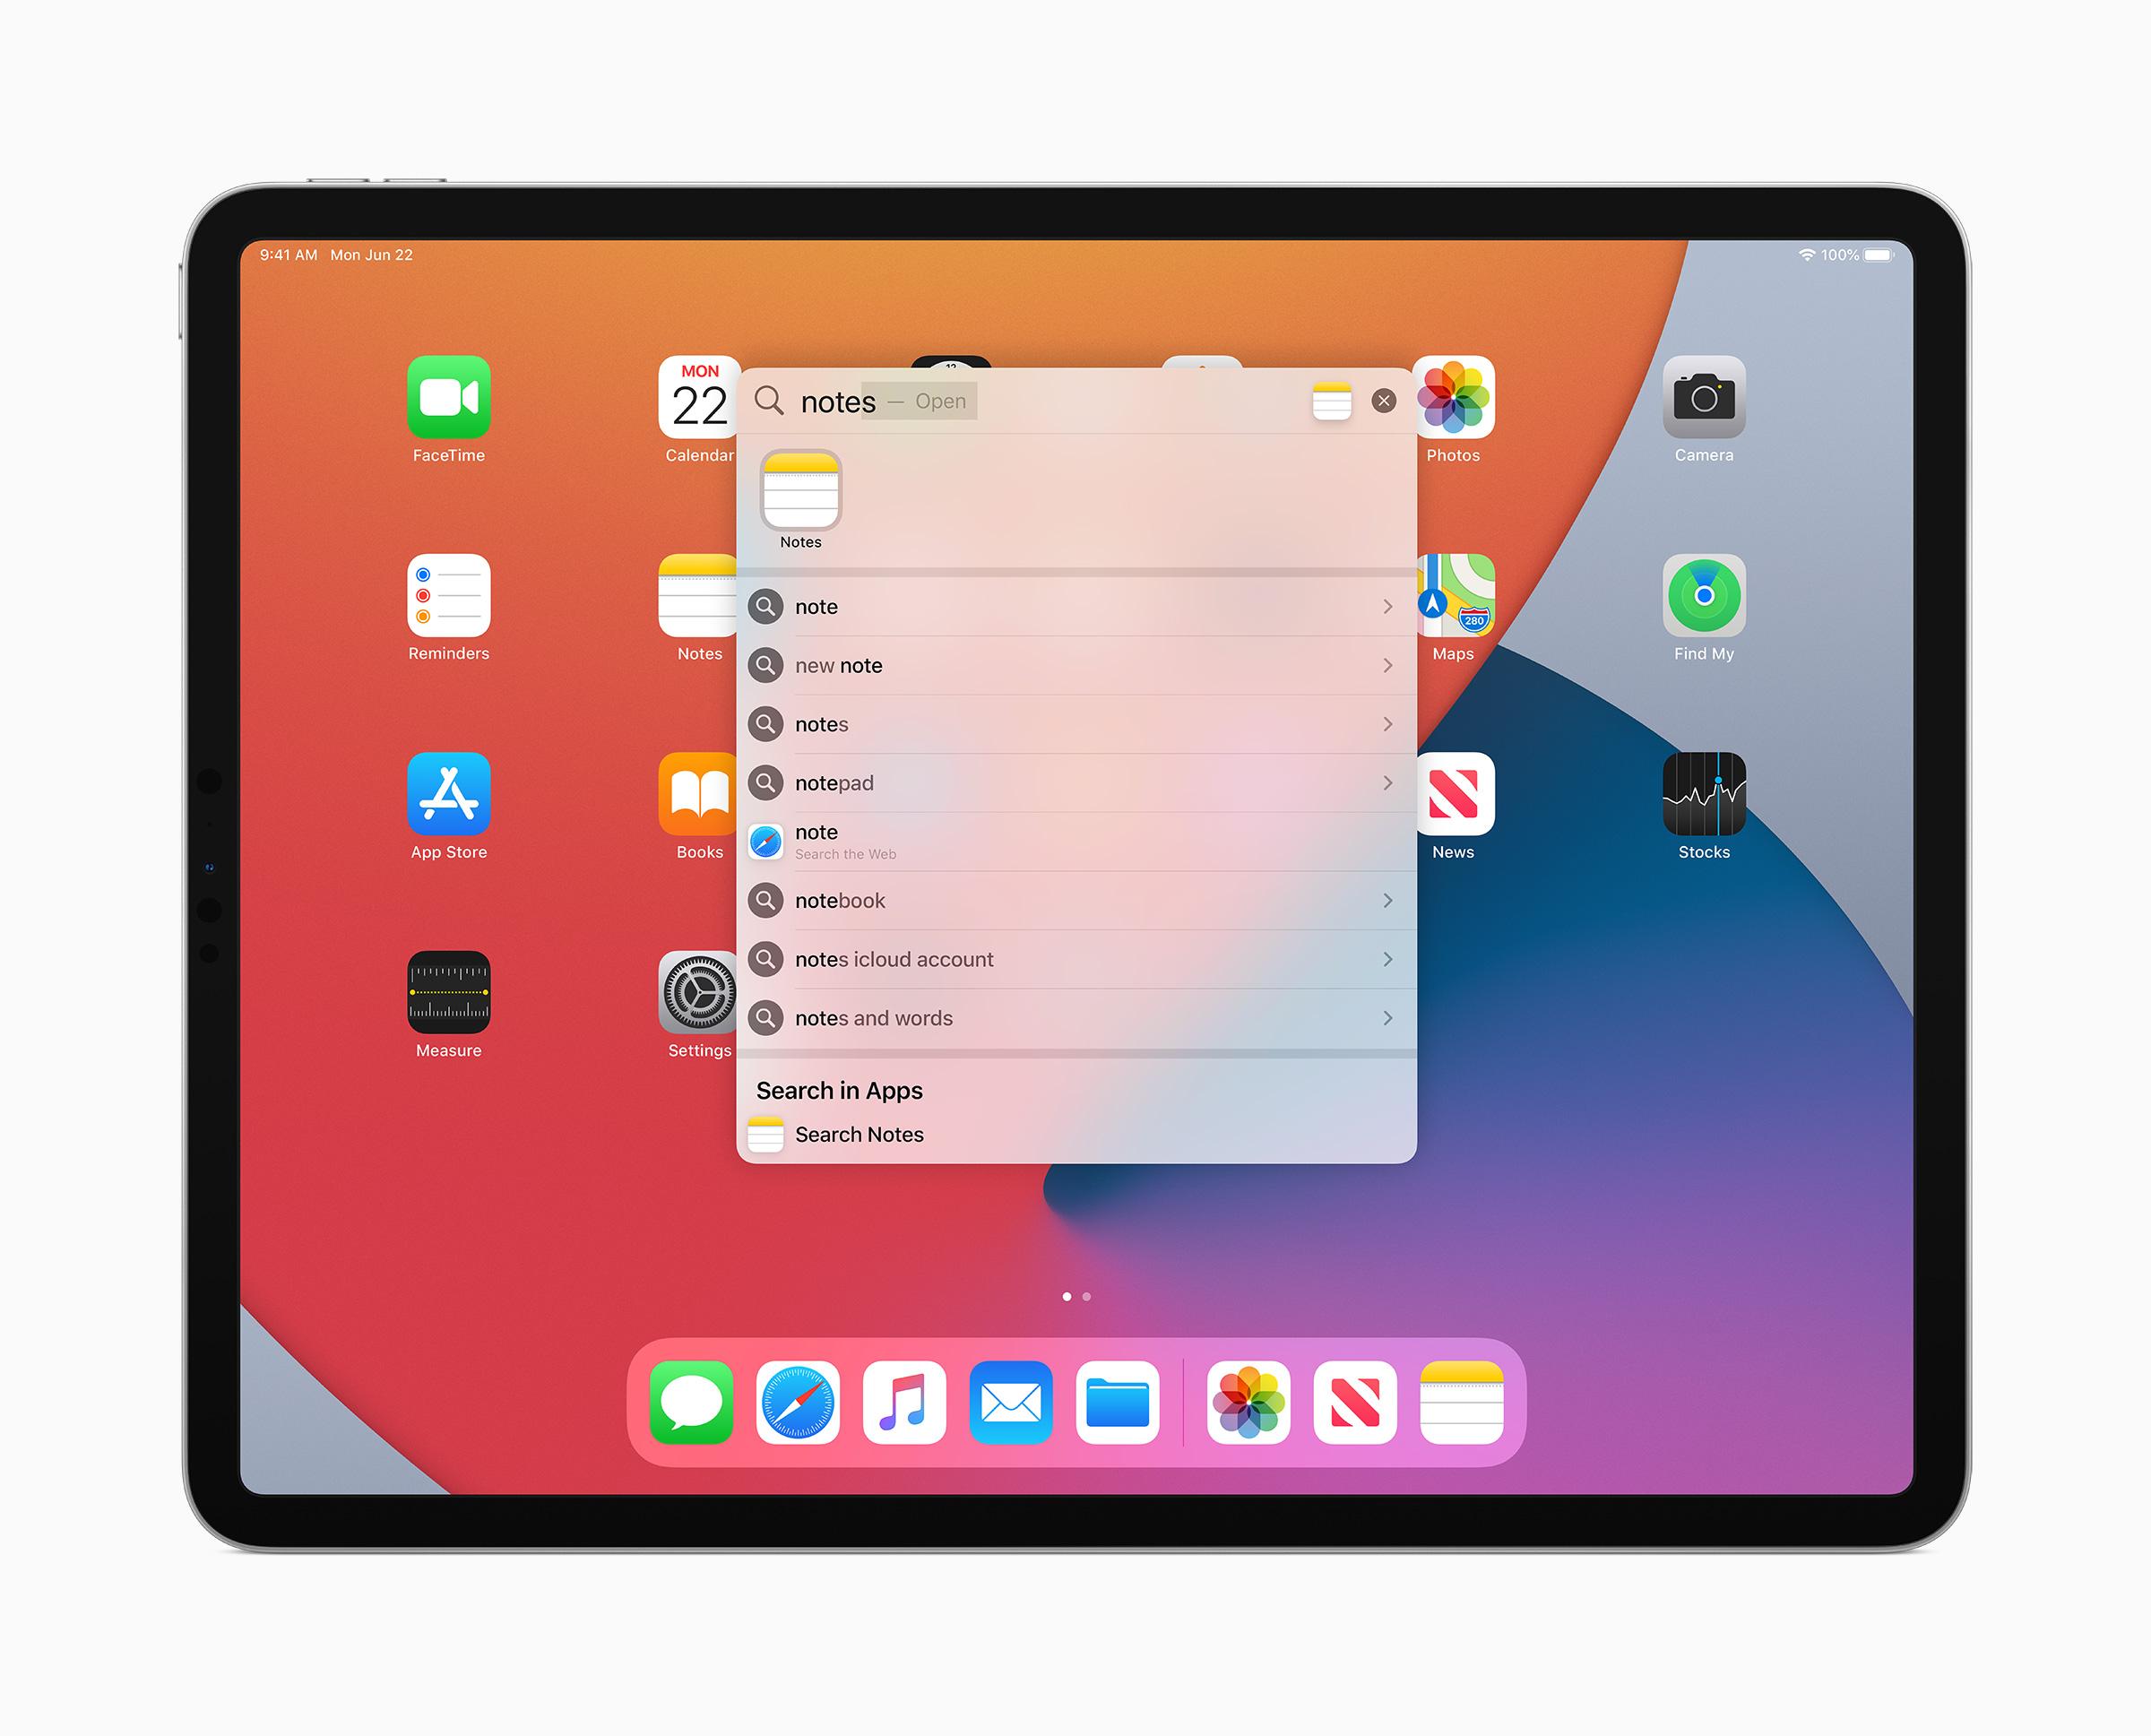 iPadOS 14 search bar new updates